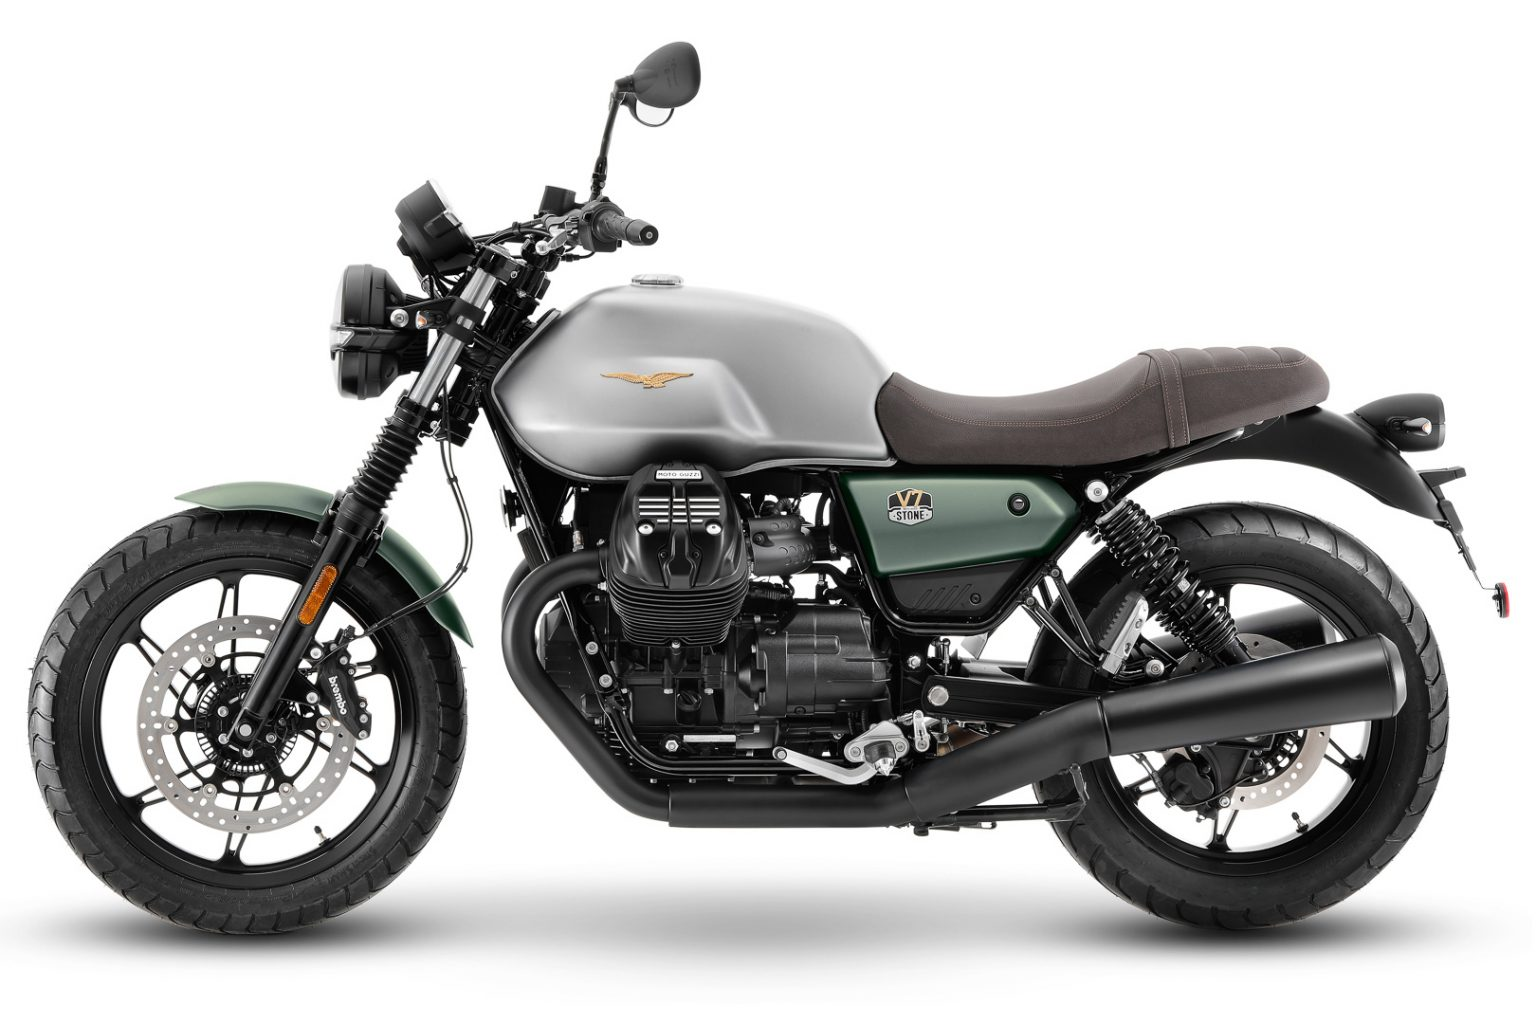 2021 Moto Guzzi V7 Stone 100th Anniversary First Look